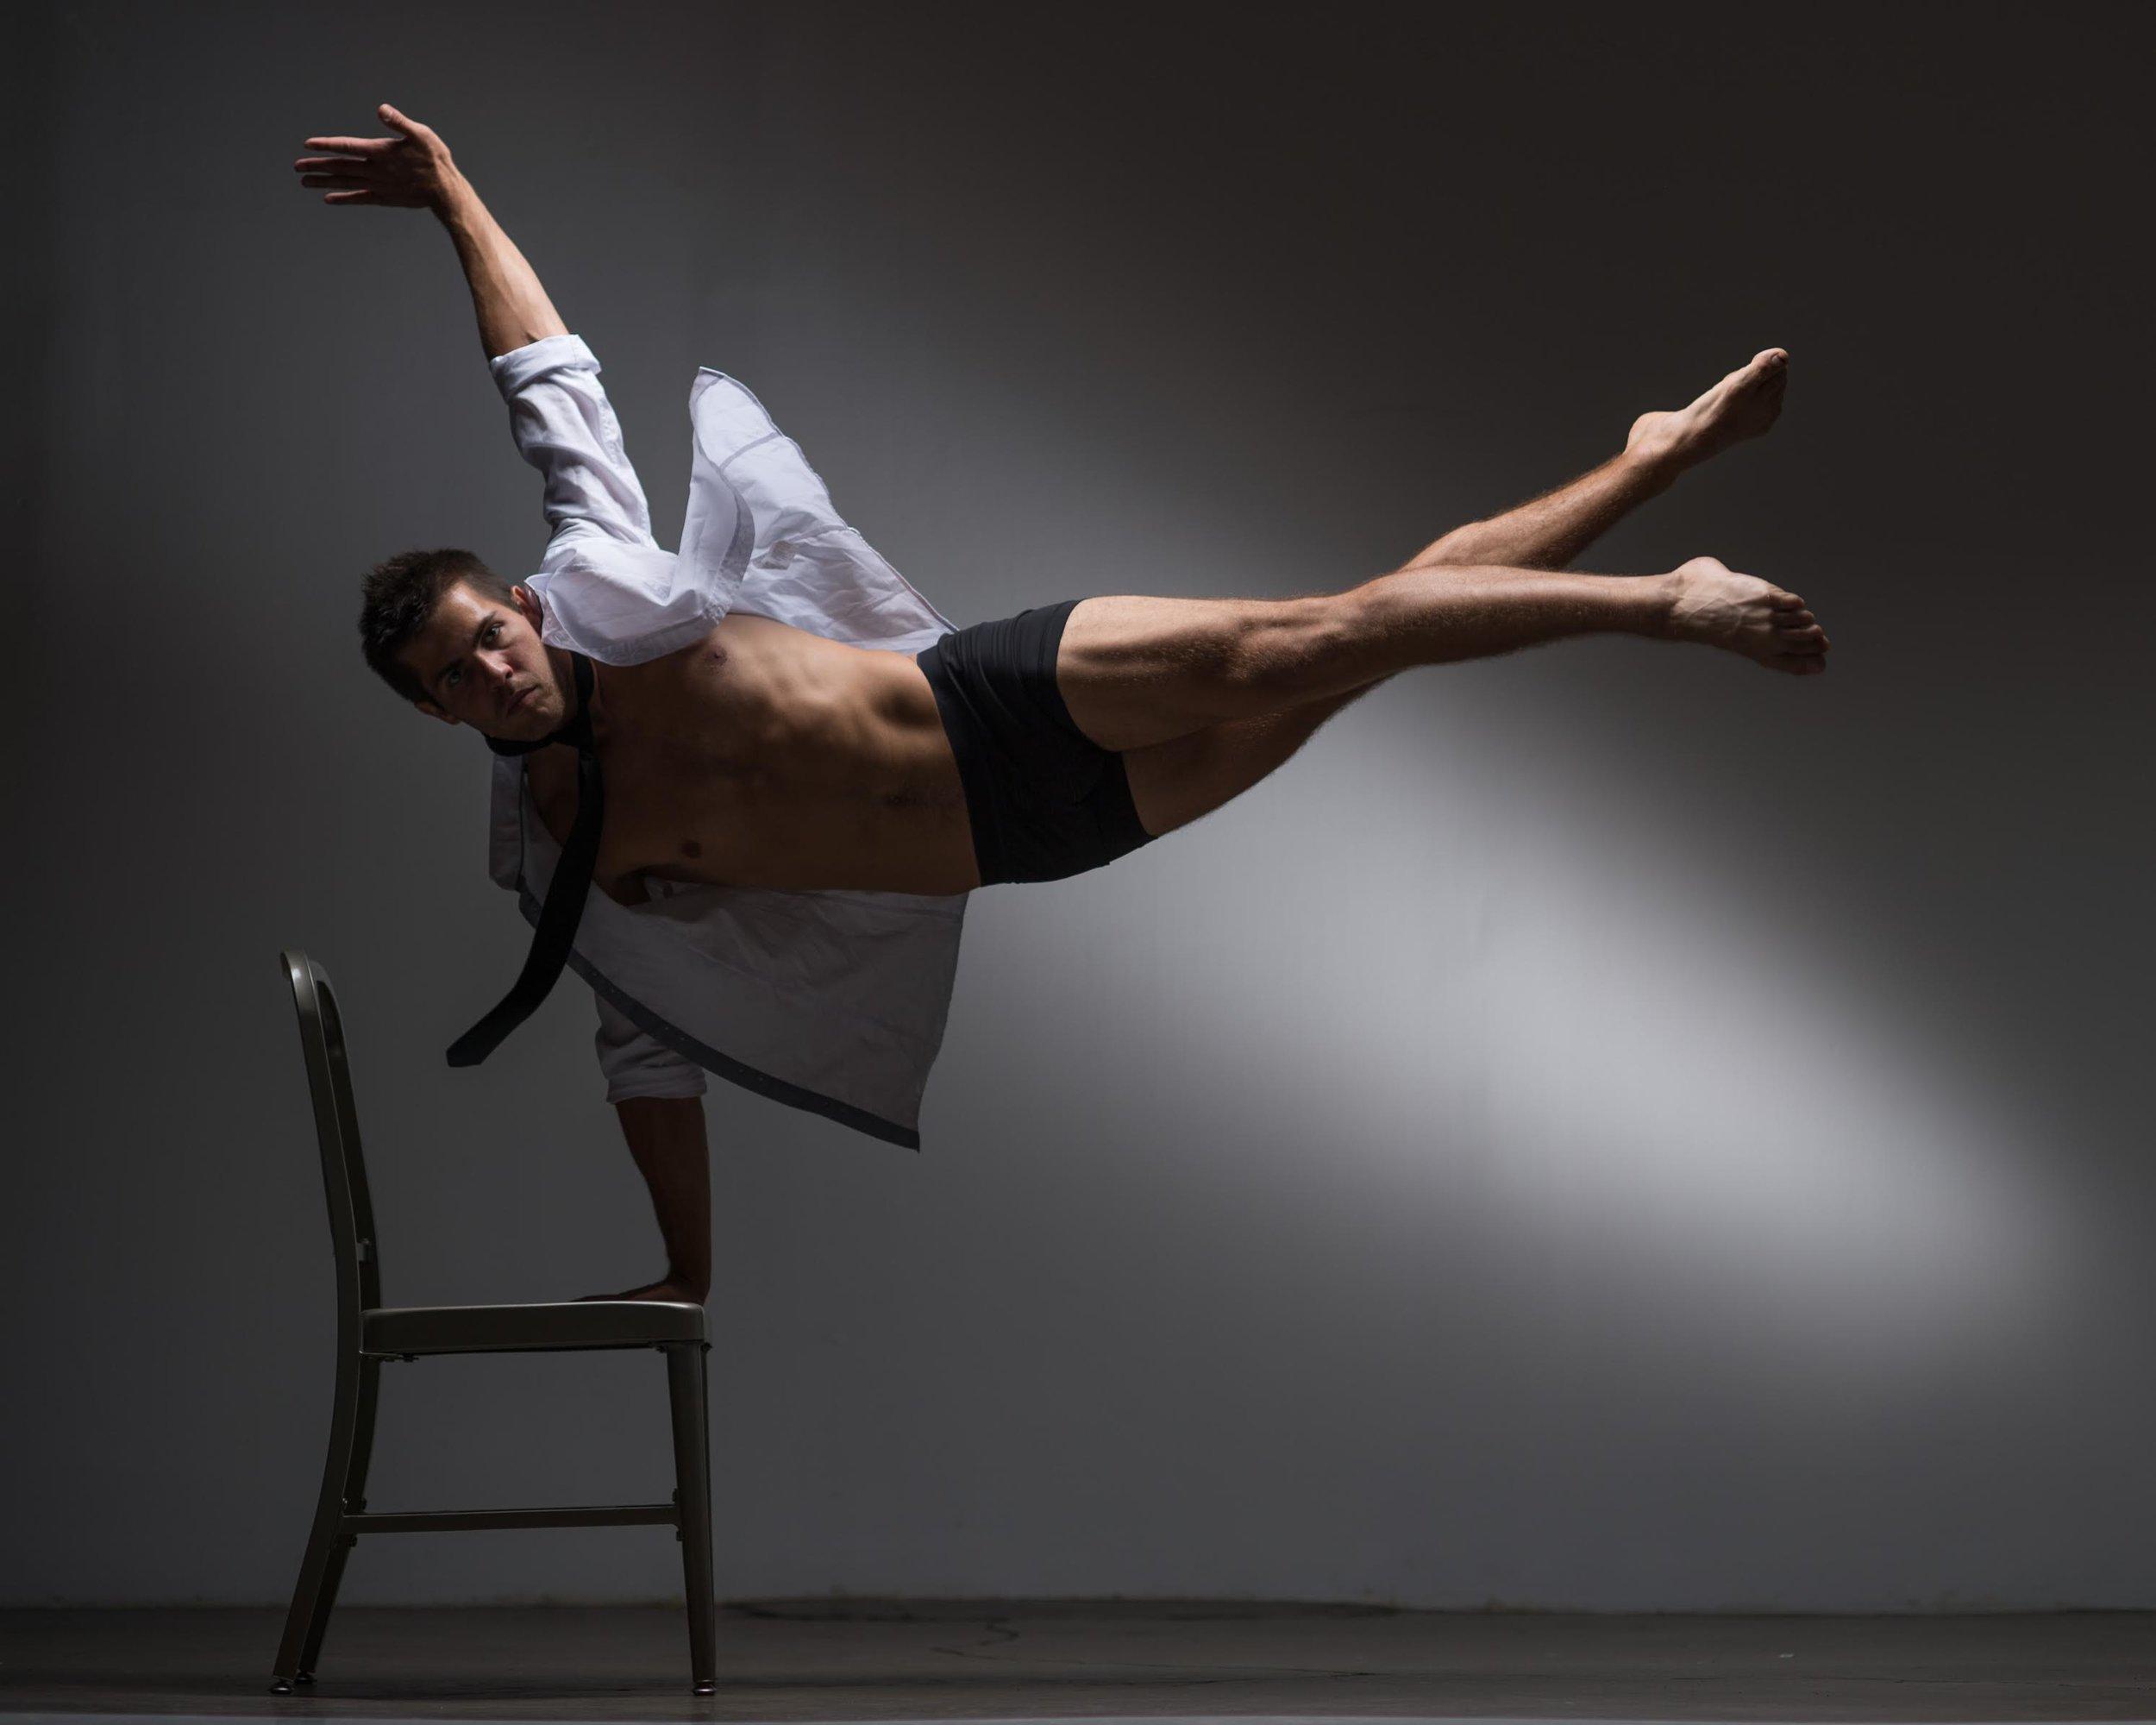 Chair Flare - Cameron Gilliam.jpg